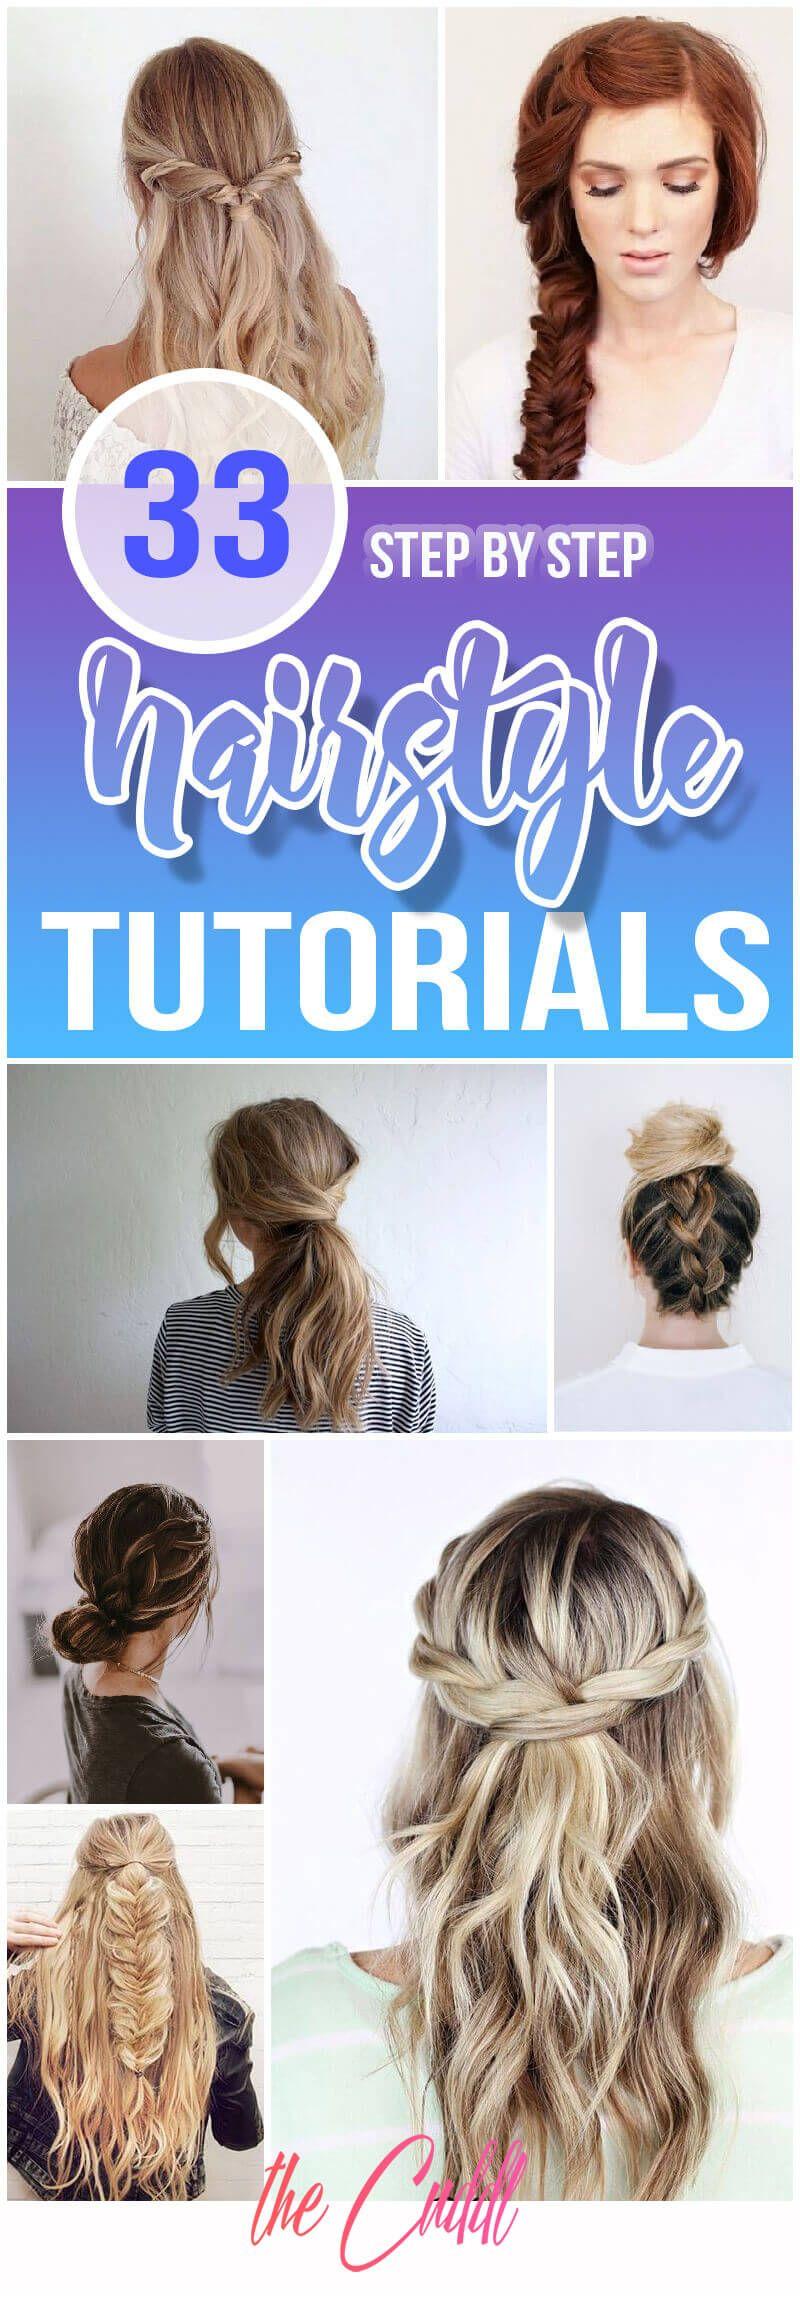 33 Most Popular Step By Step Hairstyle Tutorials #hairstyletutorials